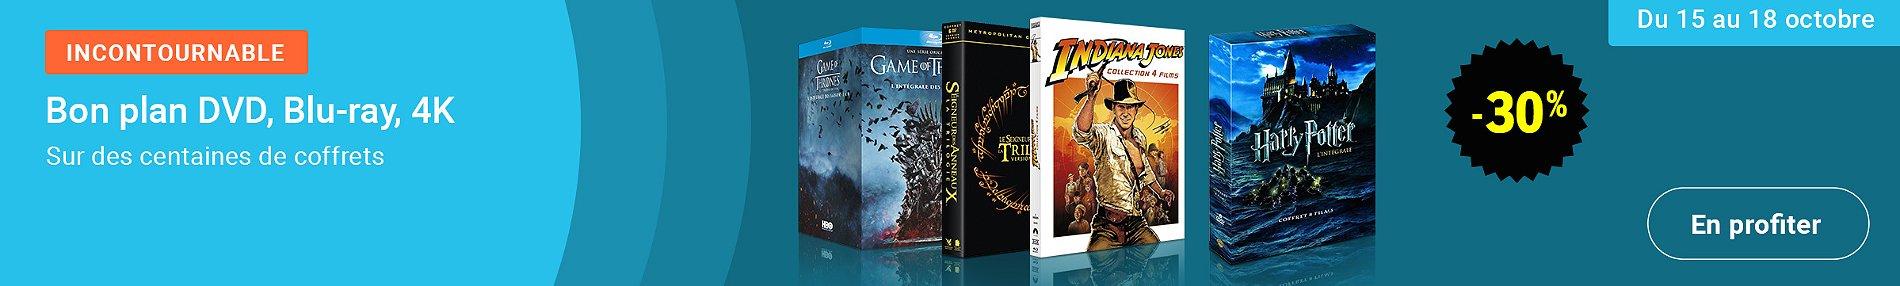 Promotion : -30% sur des coffrets DVD, Blu-ray, 4K